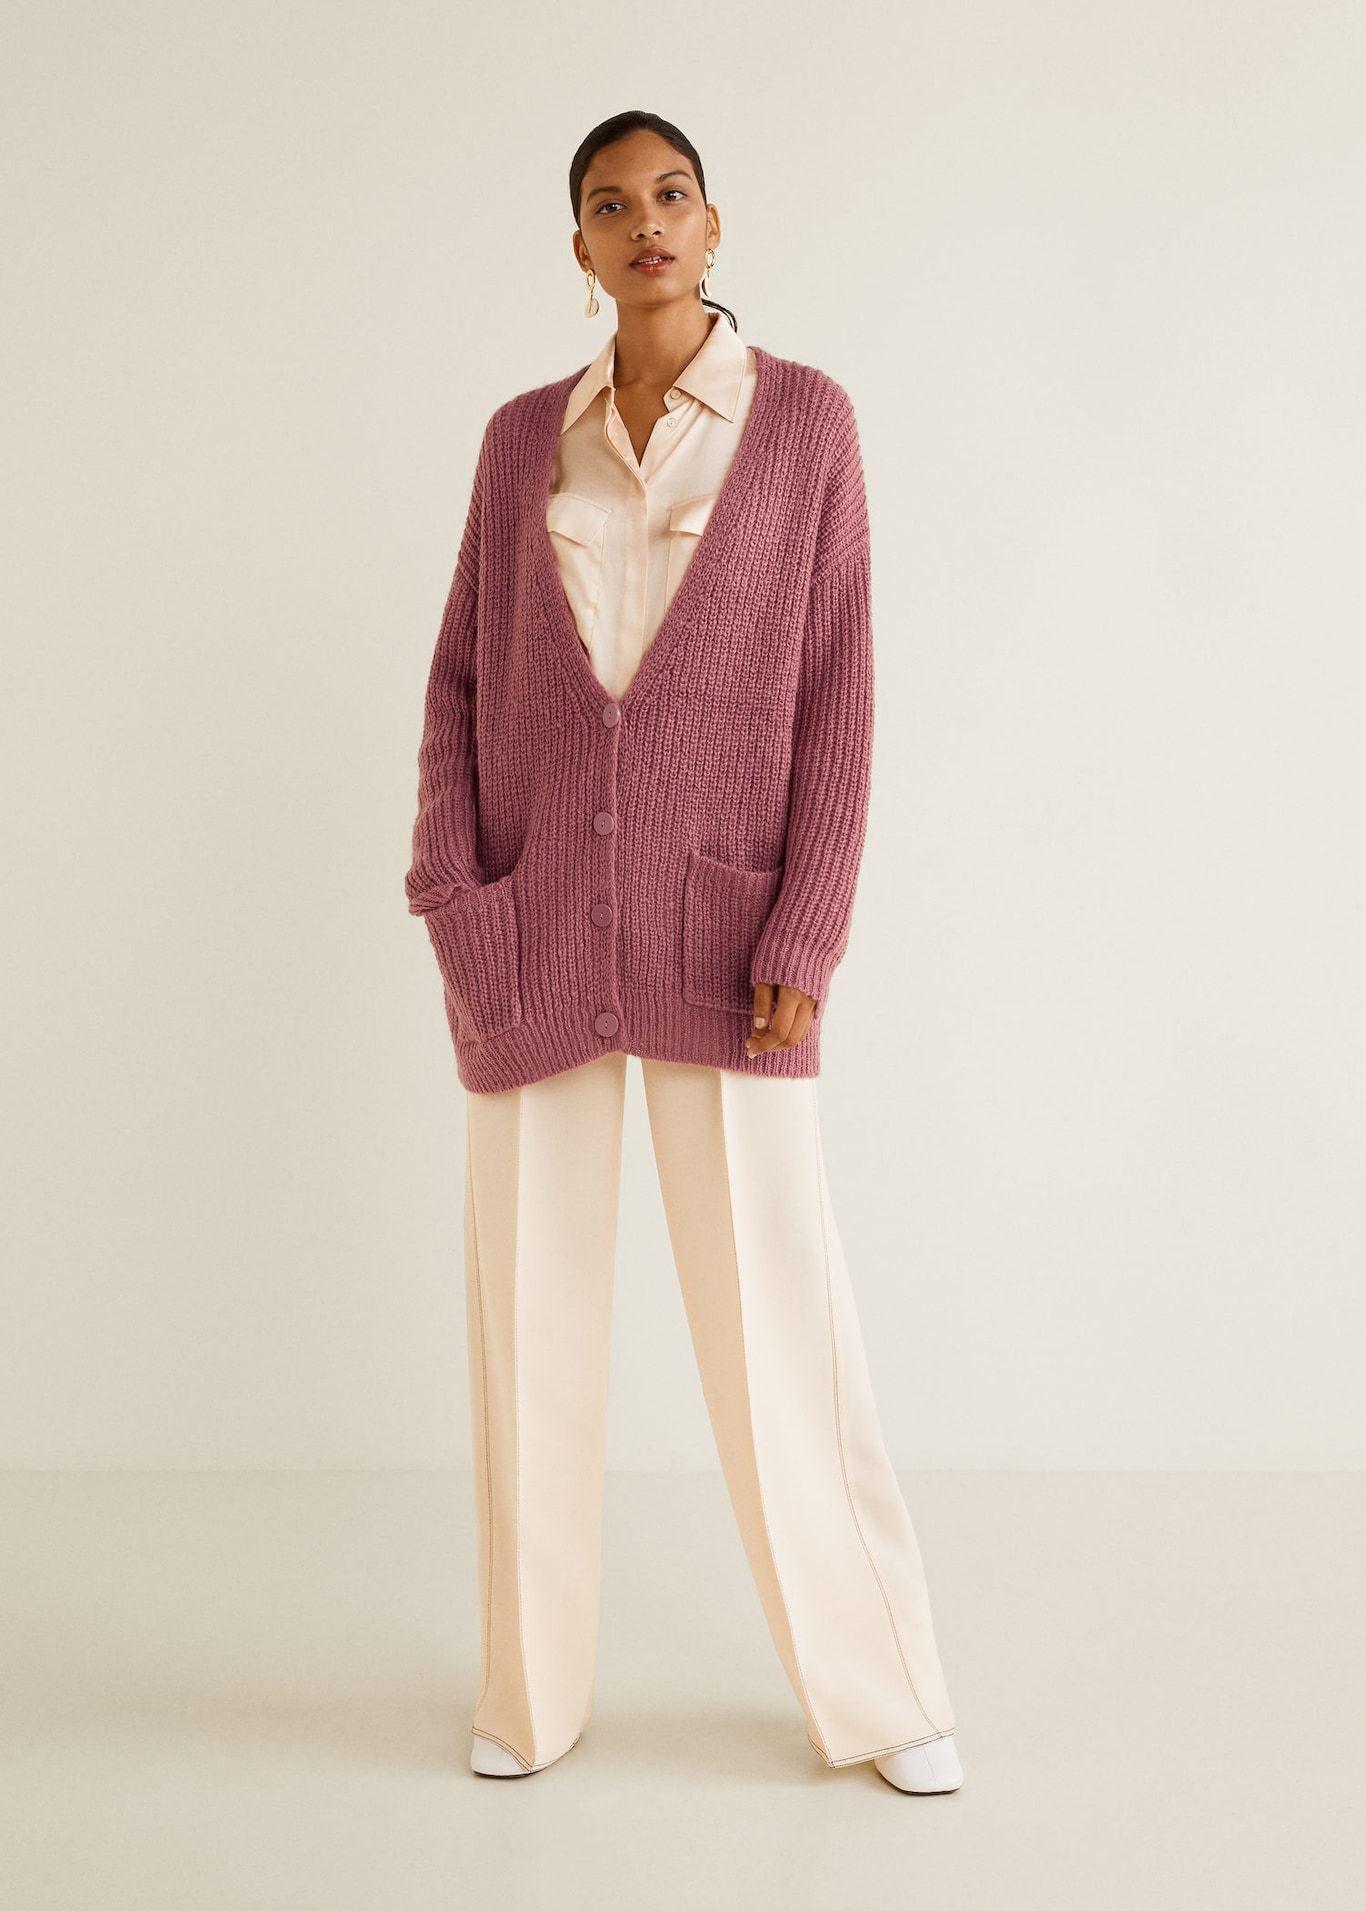 moda maglie inverno 2019, tendenza maglie mohair 2019